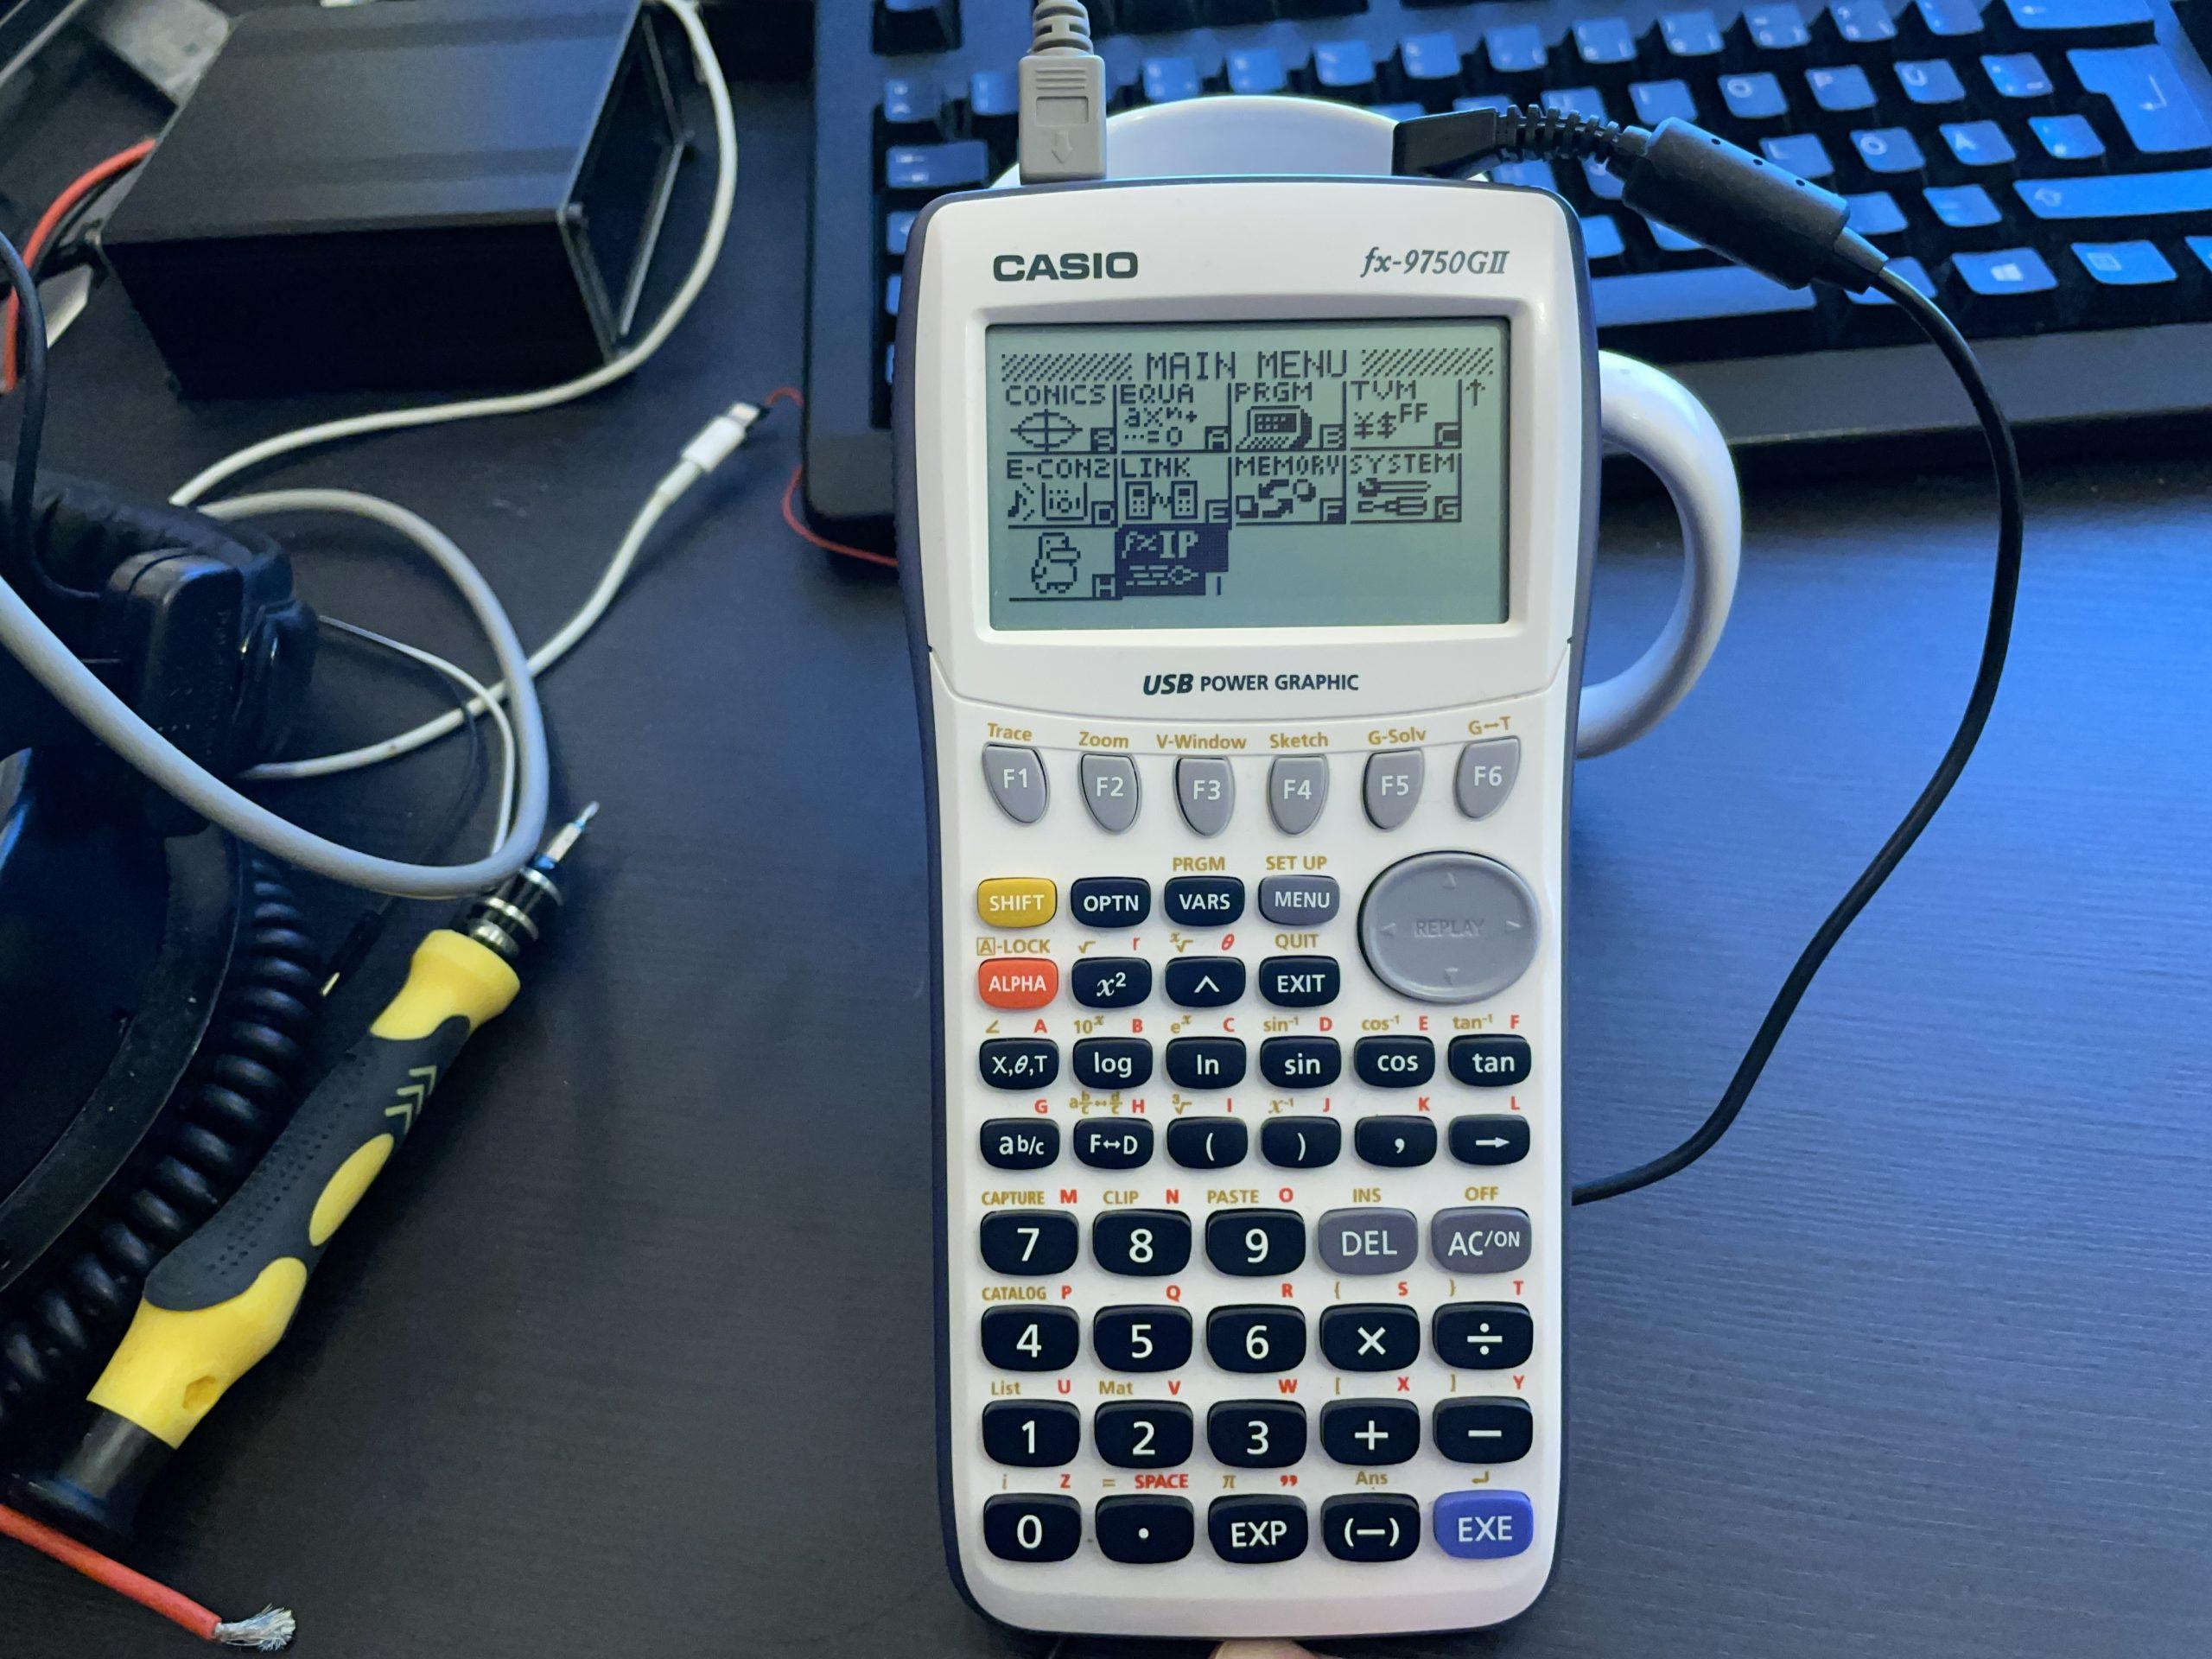 Запуск веб-сервера на калькуляторе_1